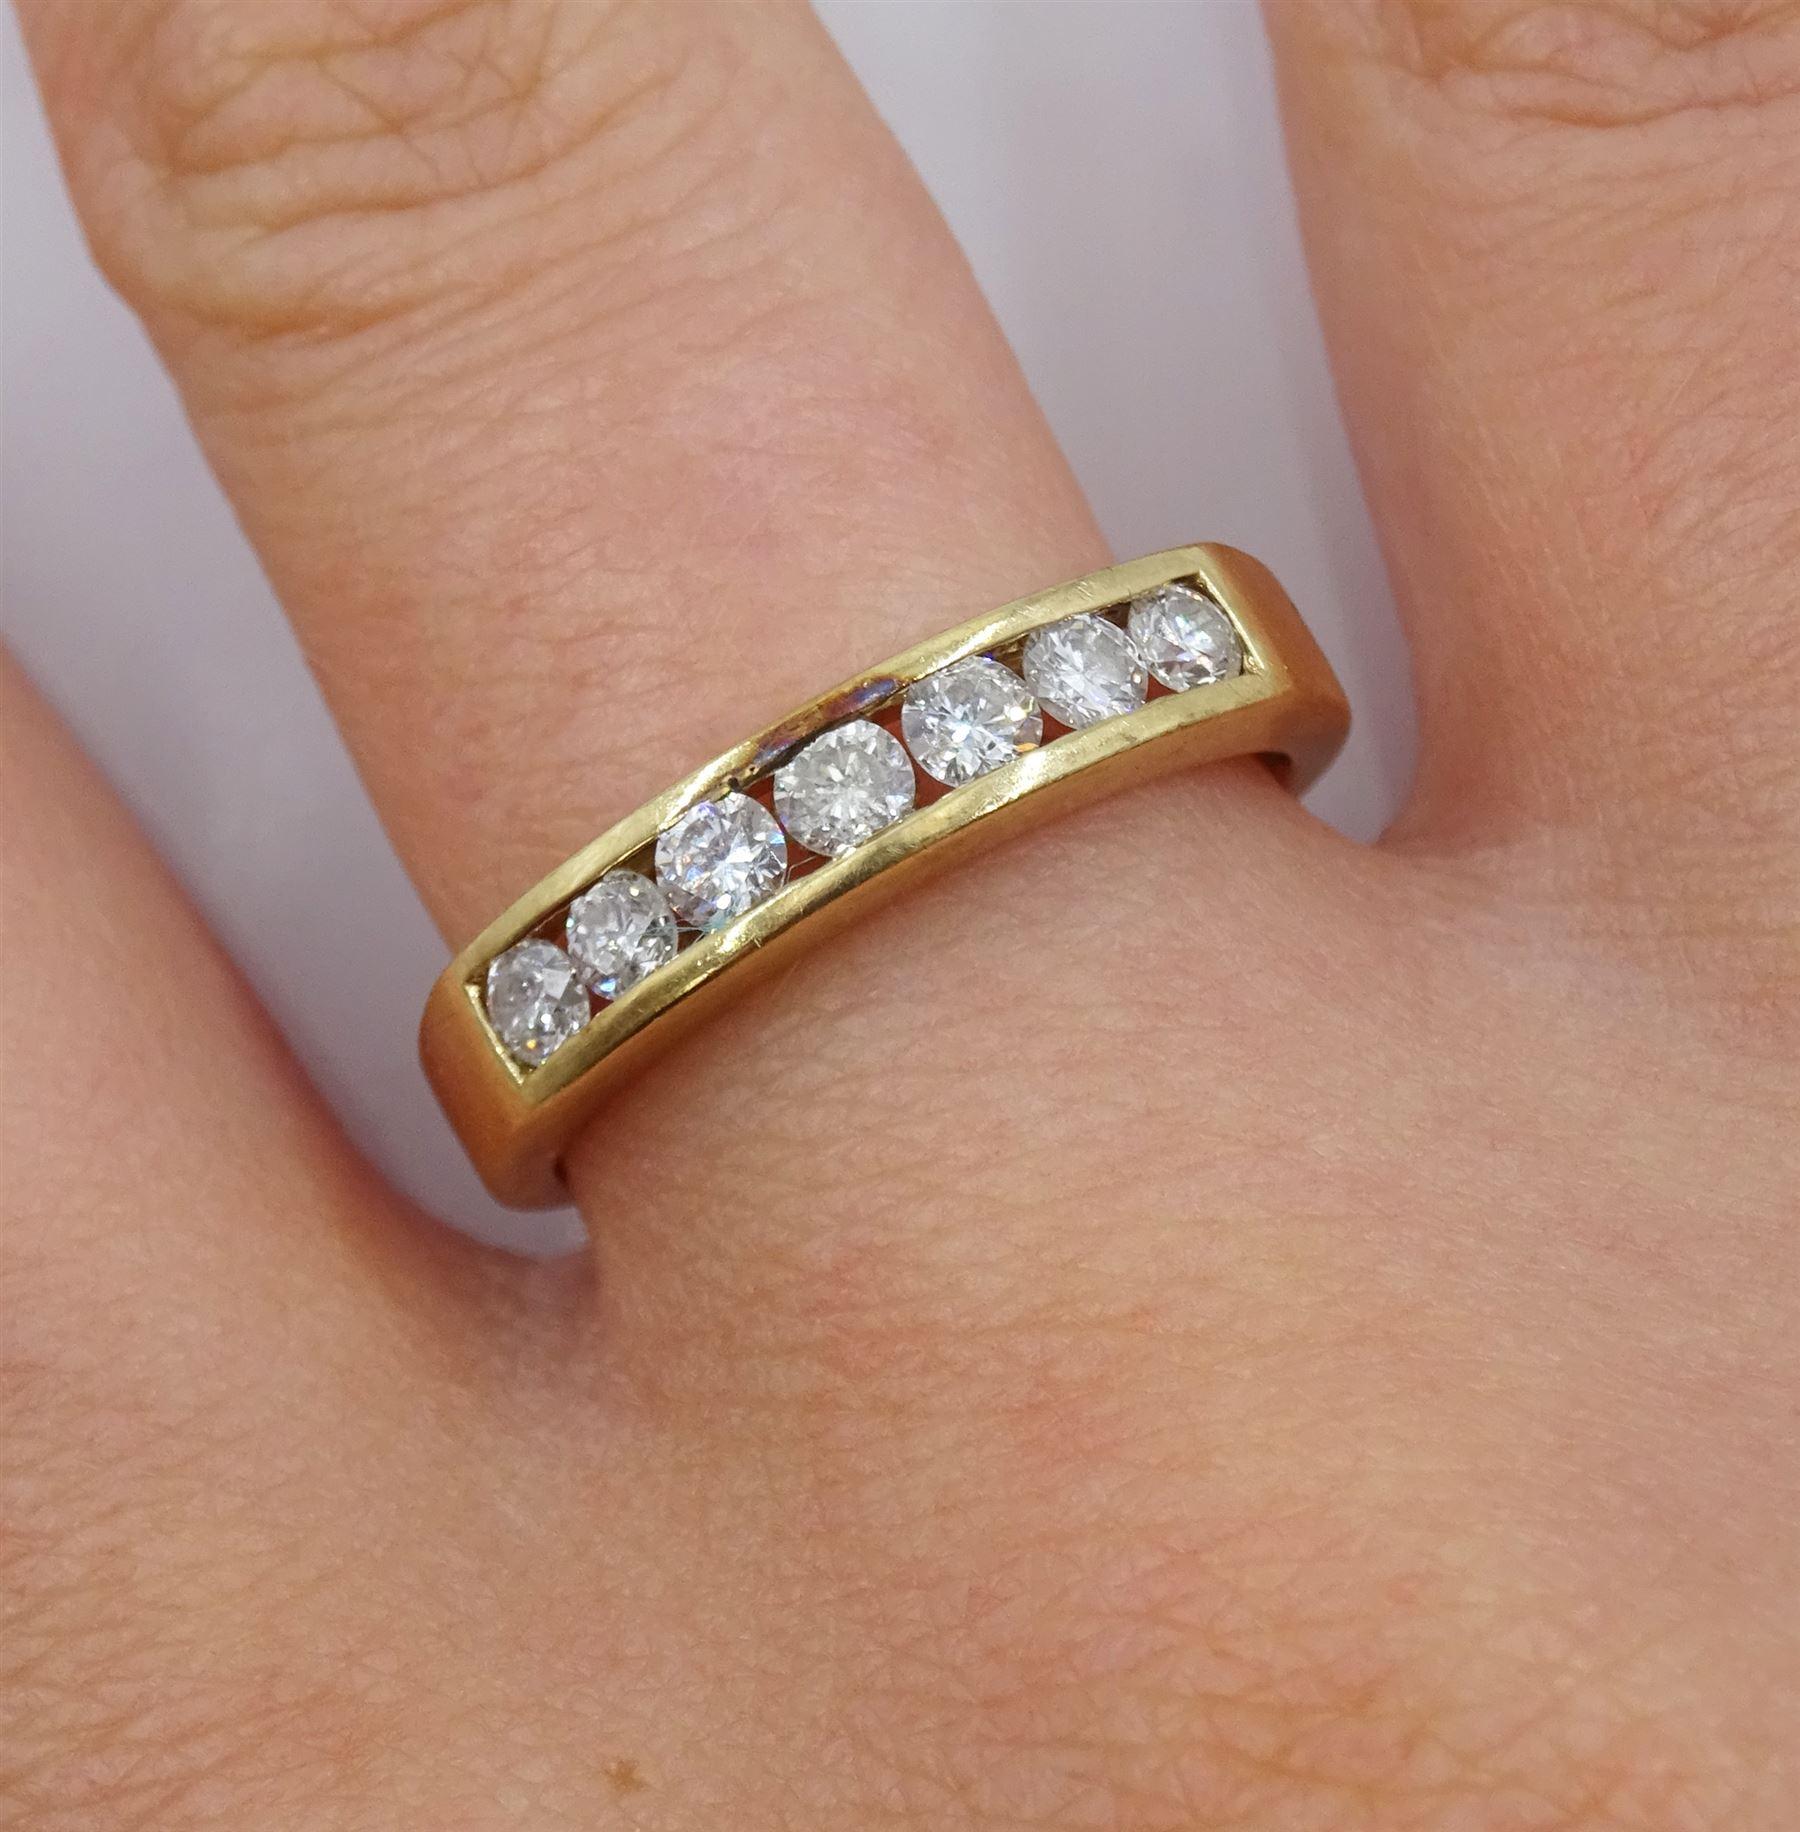 9ct gold round brilliant cut diamond seven stone channel set stone ring - Image 2 of 4